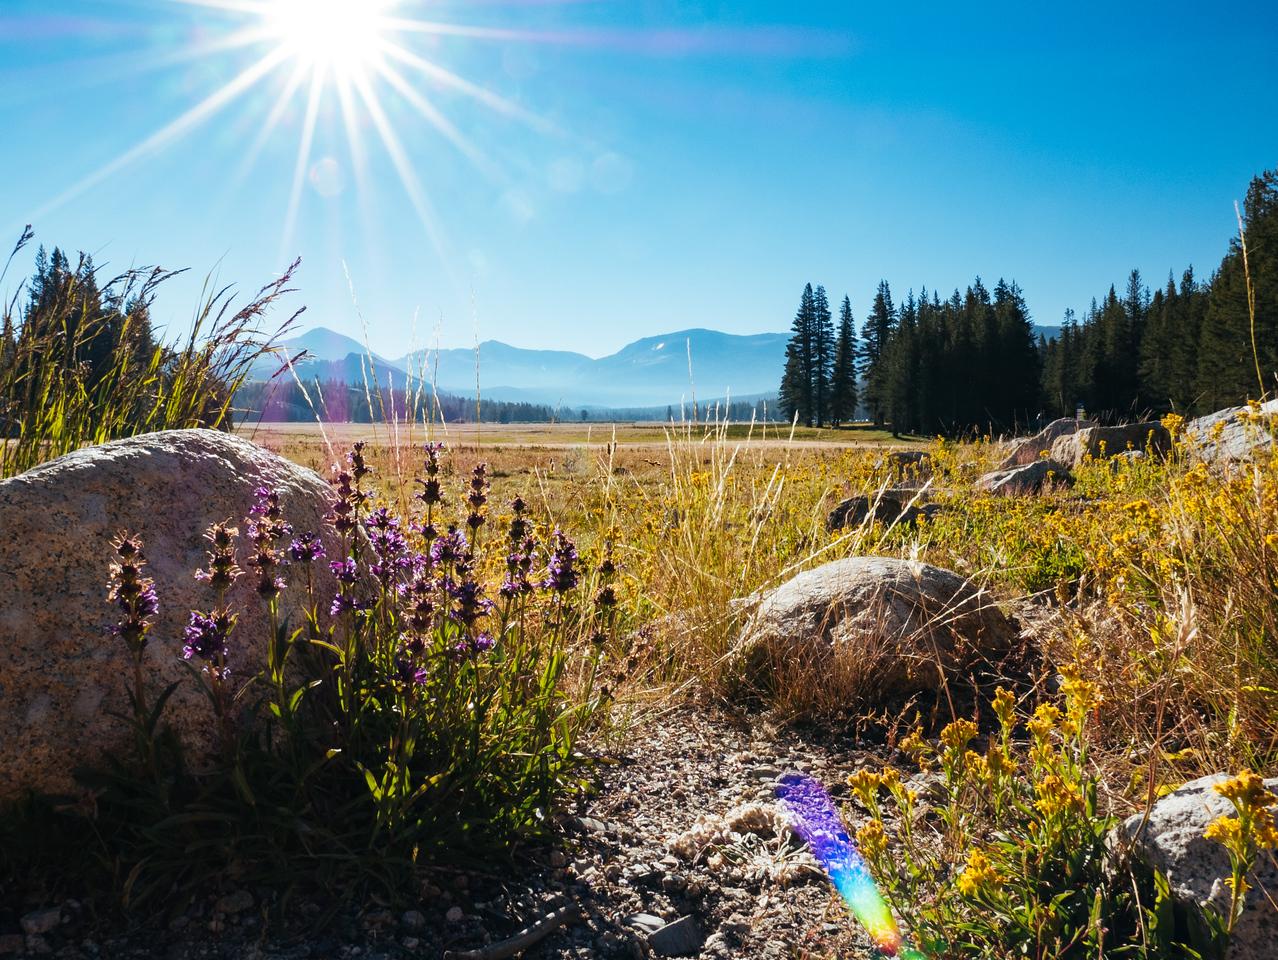 Tuolumne wildflowers